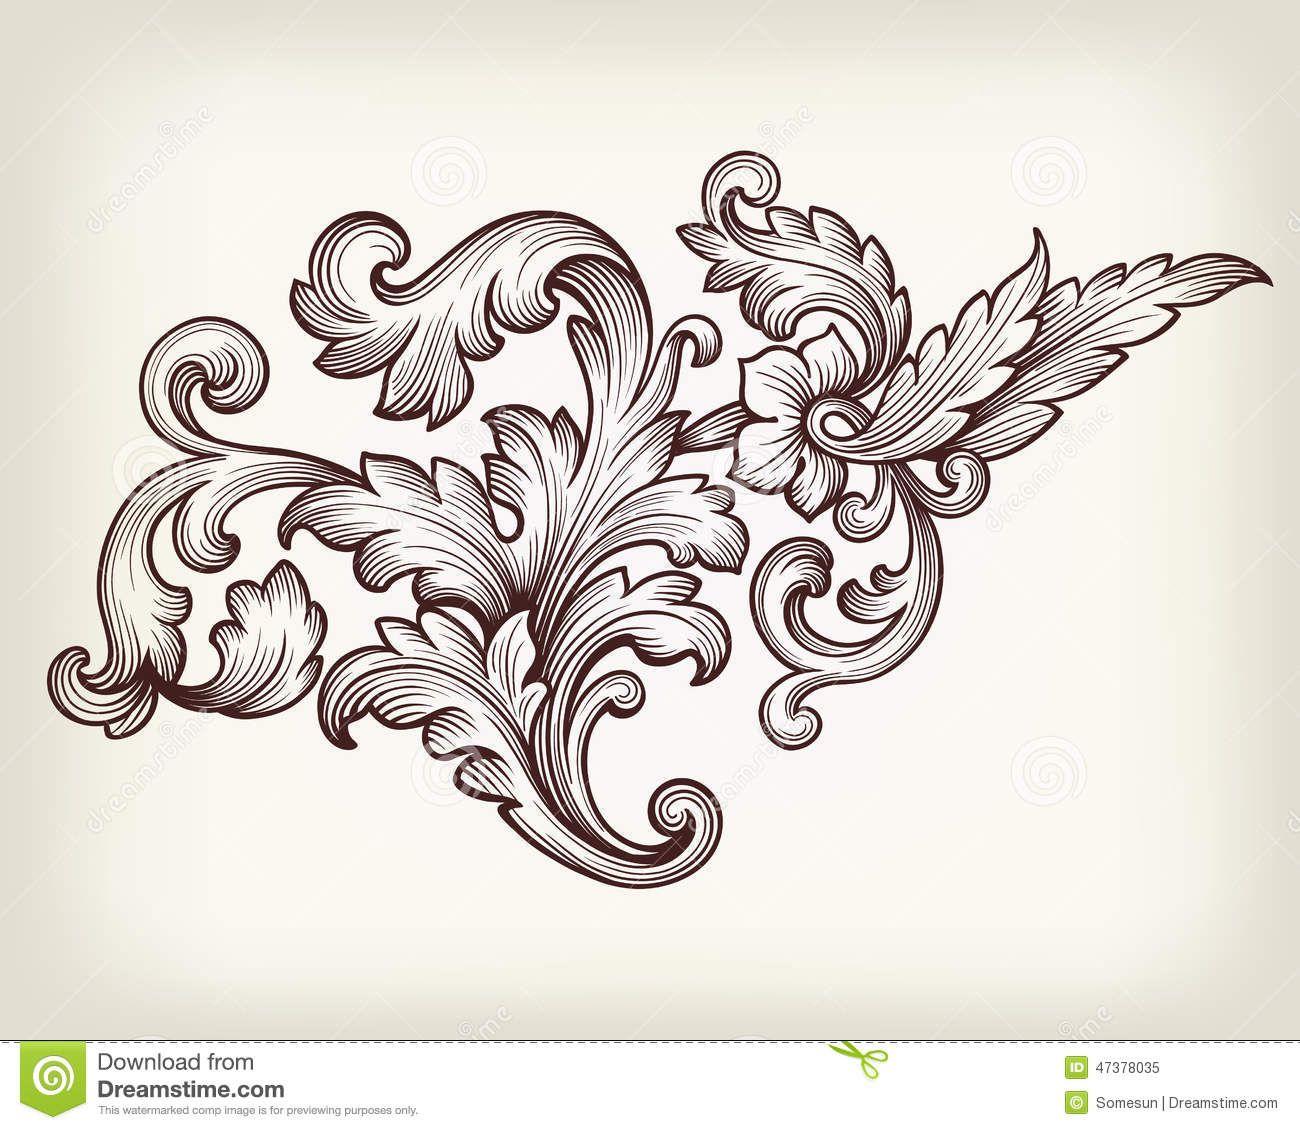 1300x1130 Vintage Baroque Floral Scroll Ornament Vector